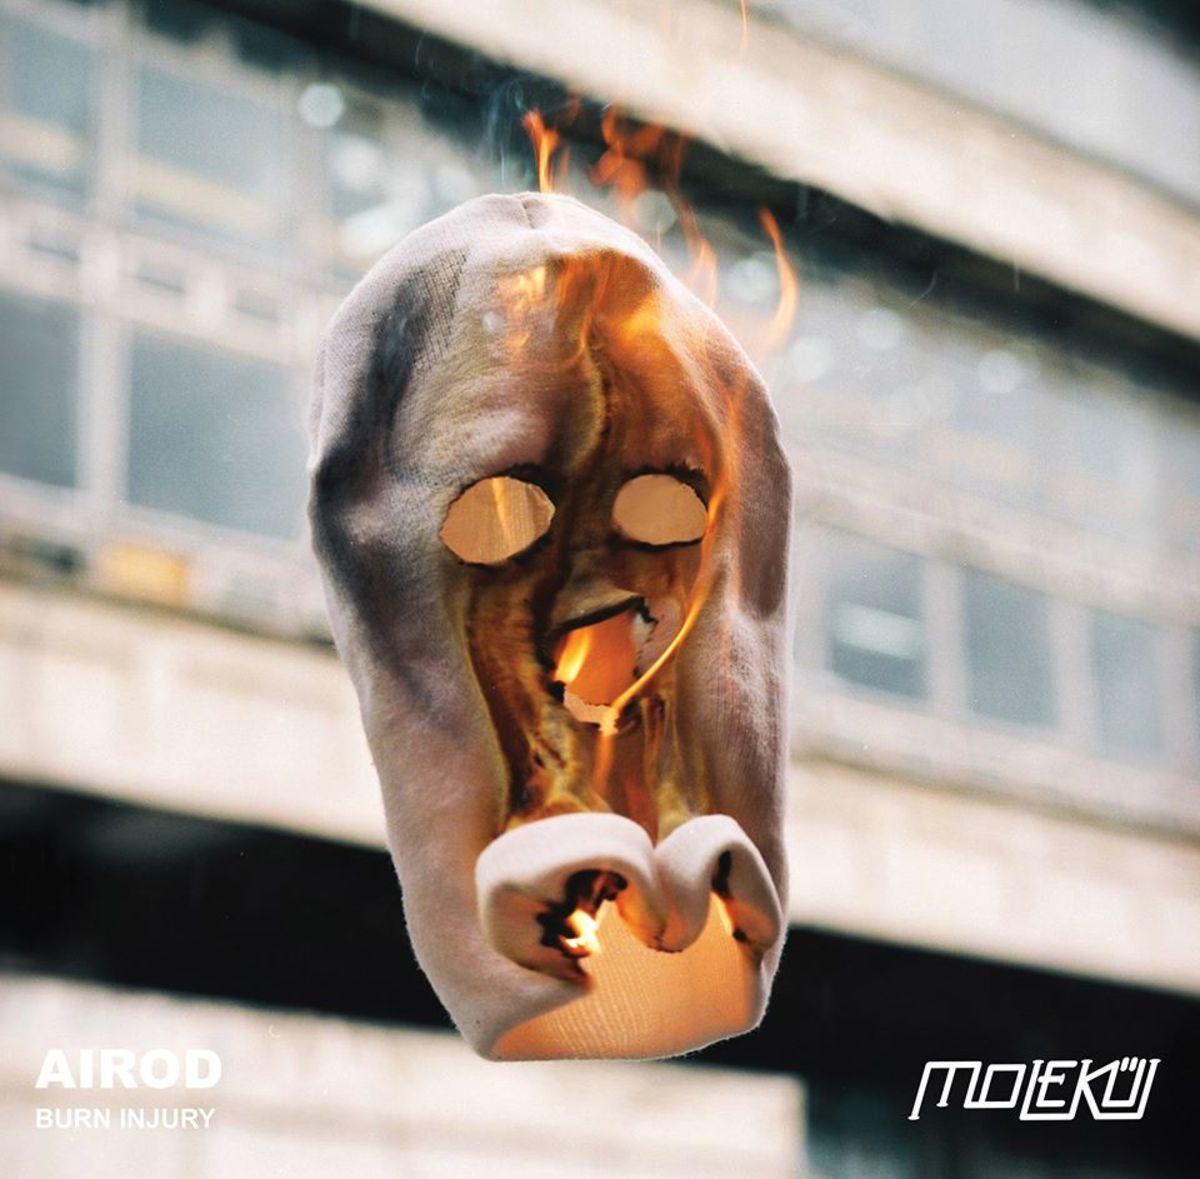 airod - burn injury cover